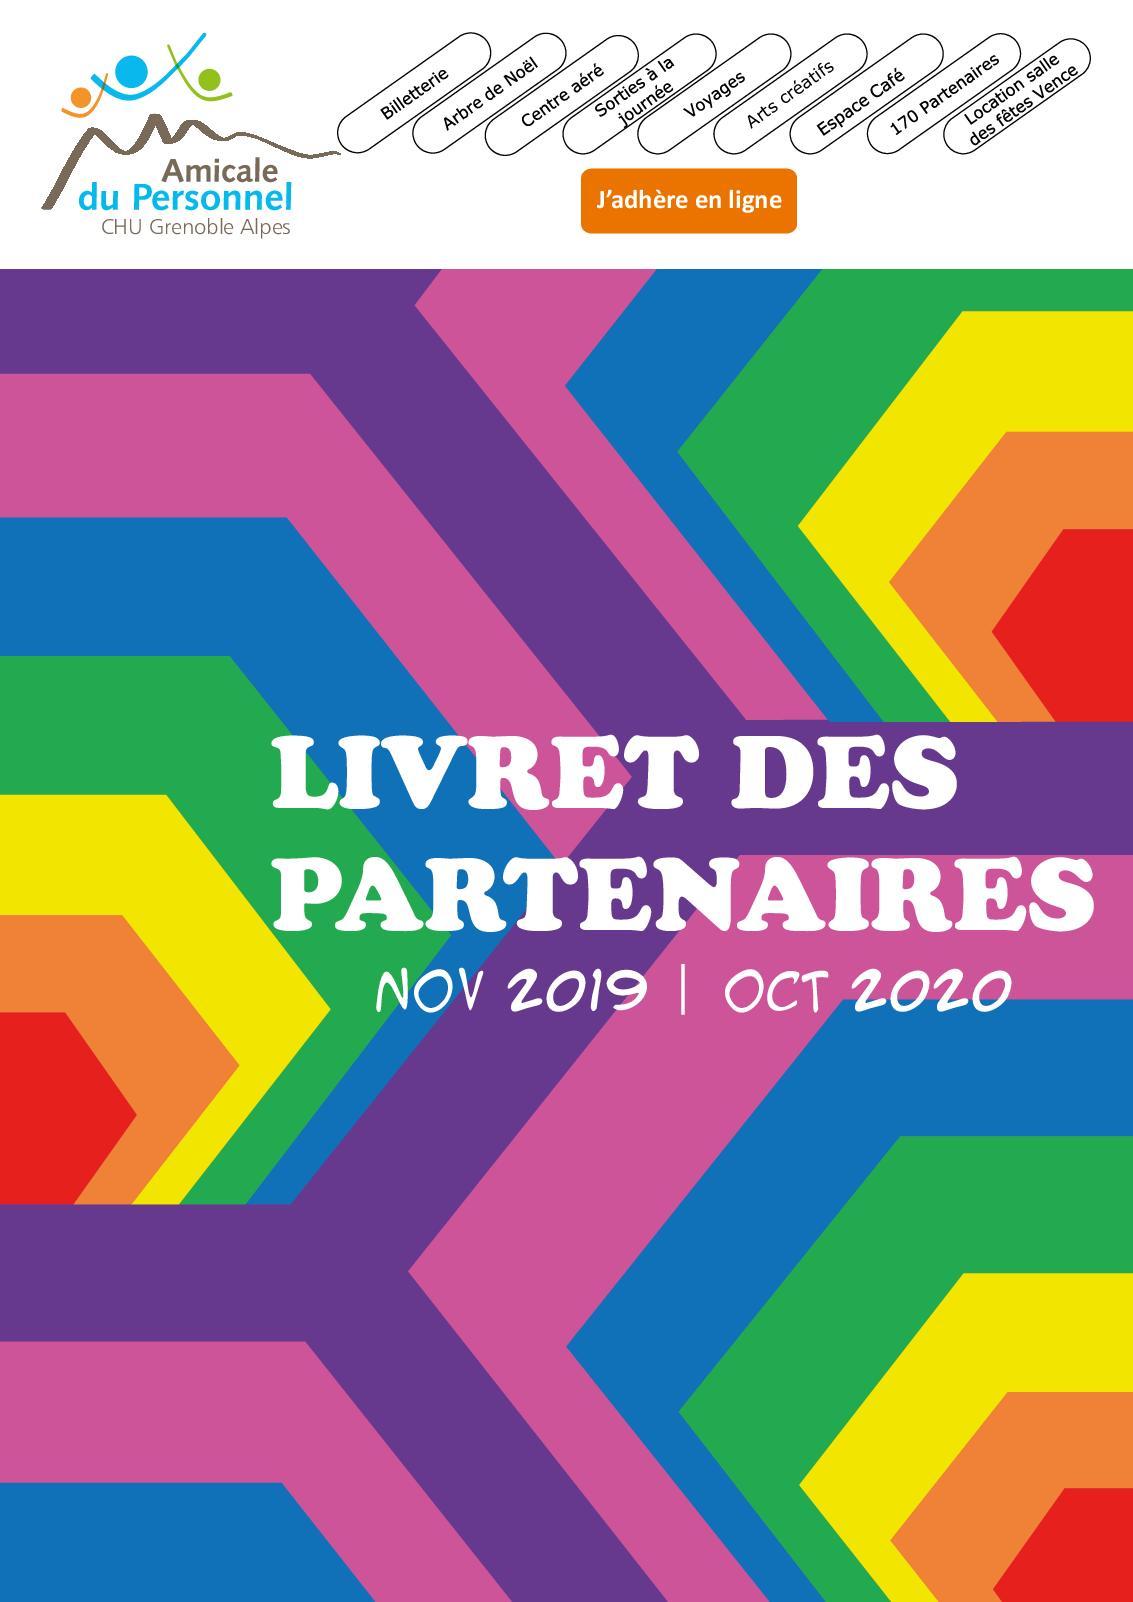 Vision Unik La Rochette calaméo - amicale chu 2019 2020 web